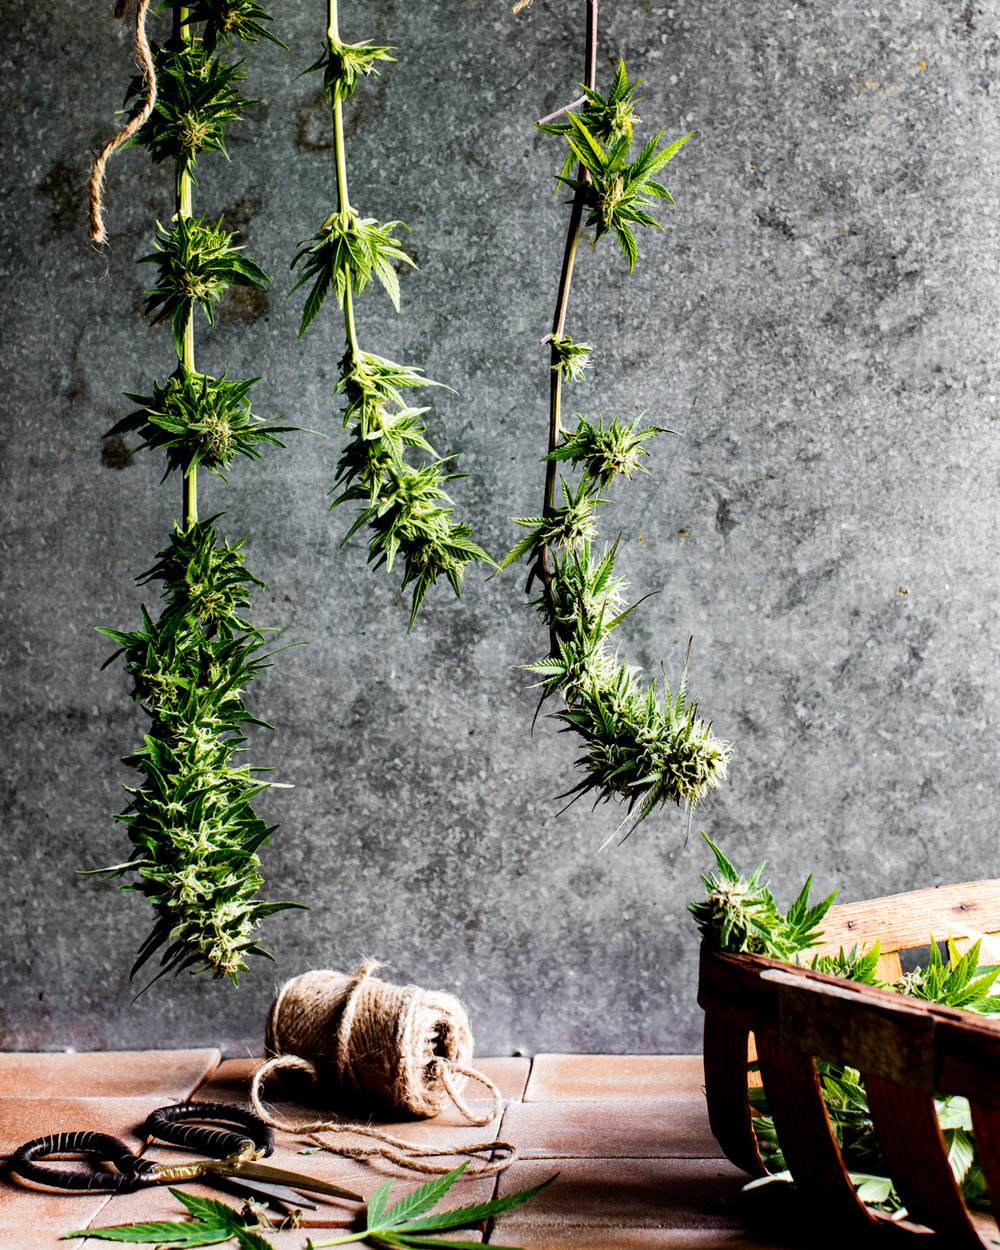 erinscottphotography_122west_cannabisgardener-6055.jpg